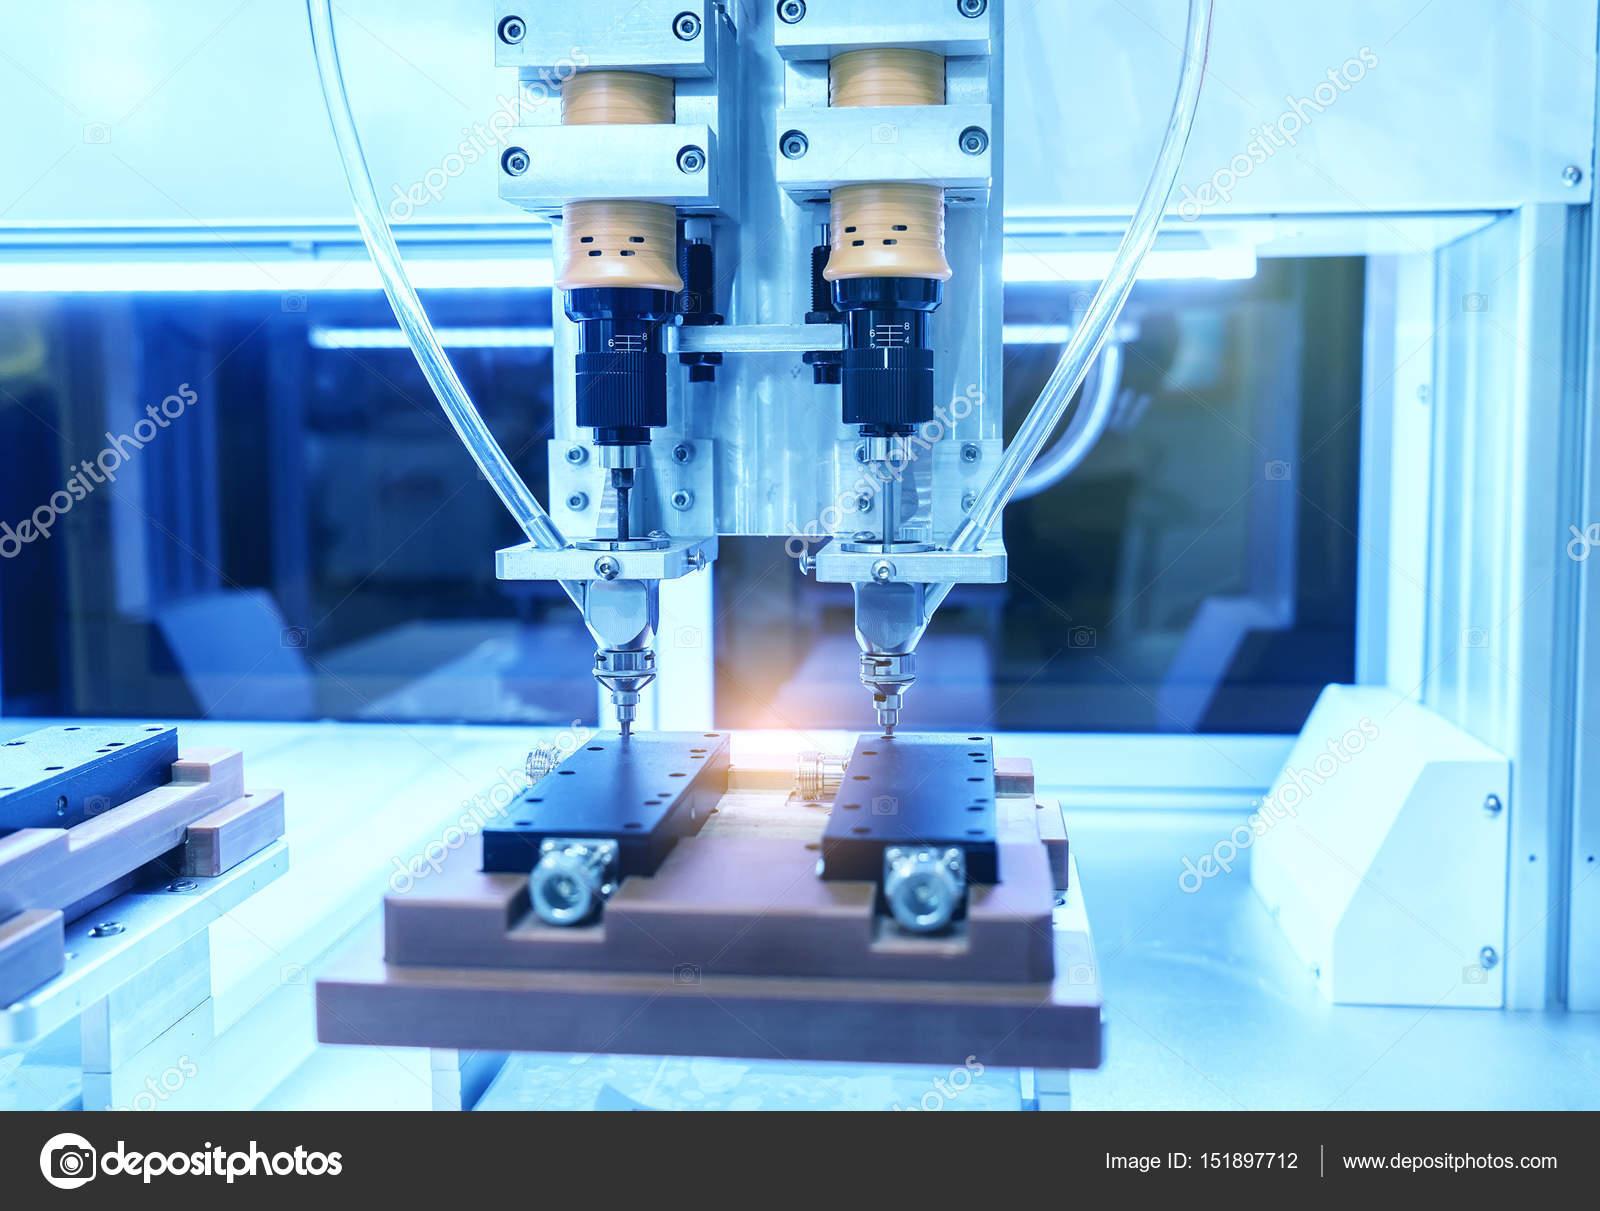 feeder new screw project tec gmbh by three